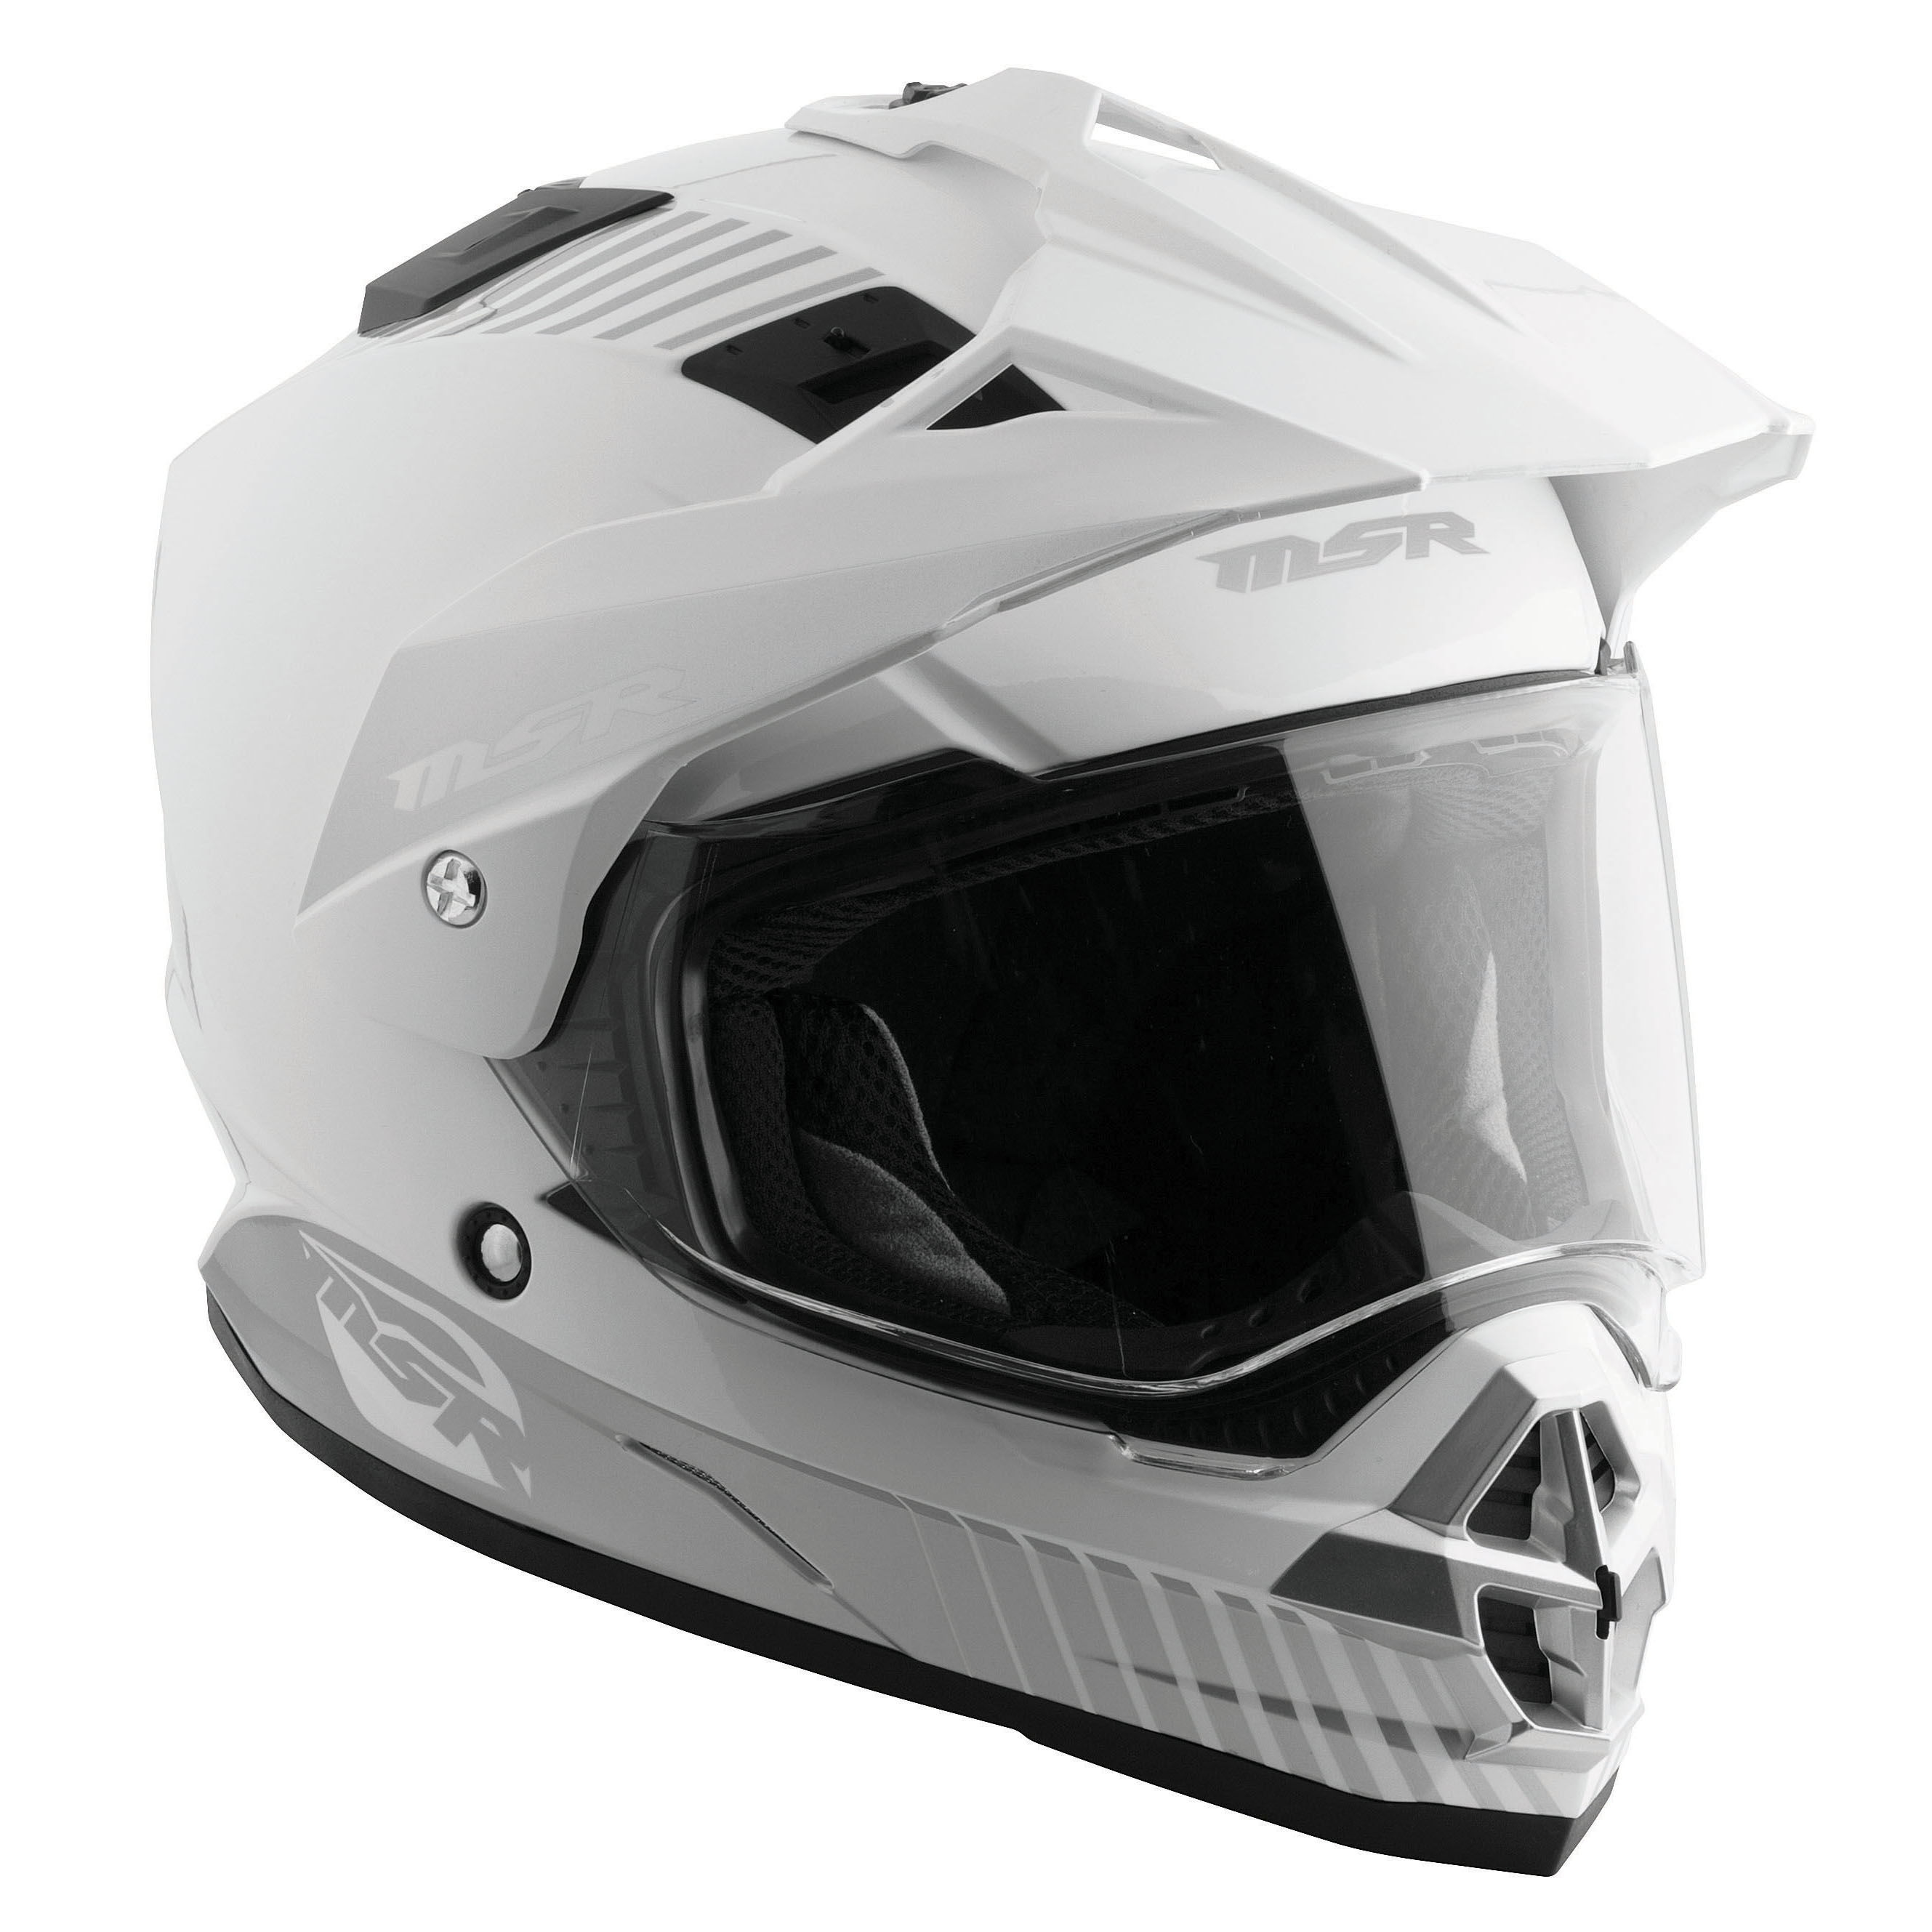 M15 Xpedition Helmet